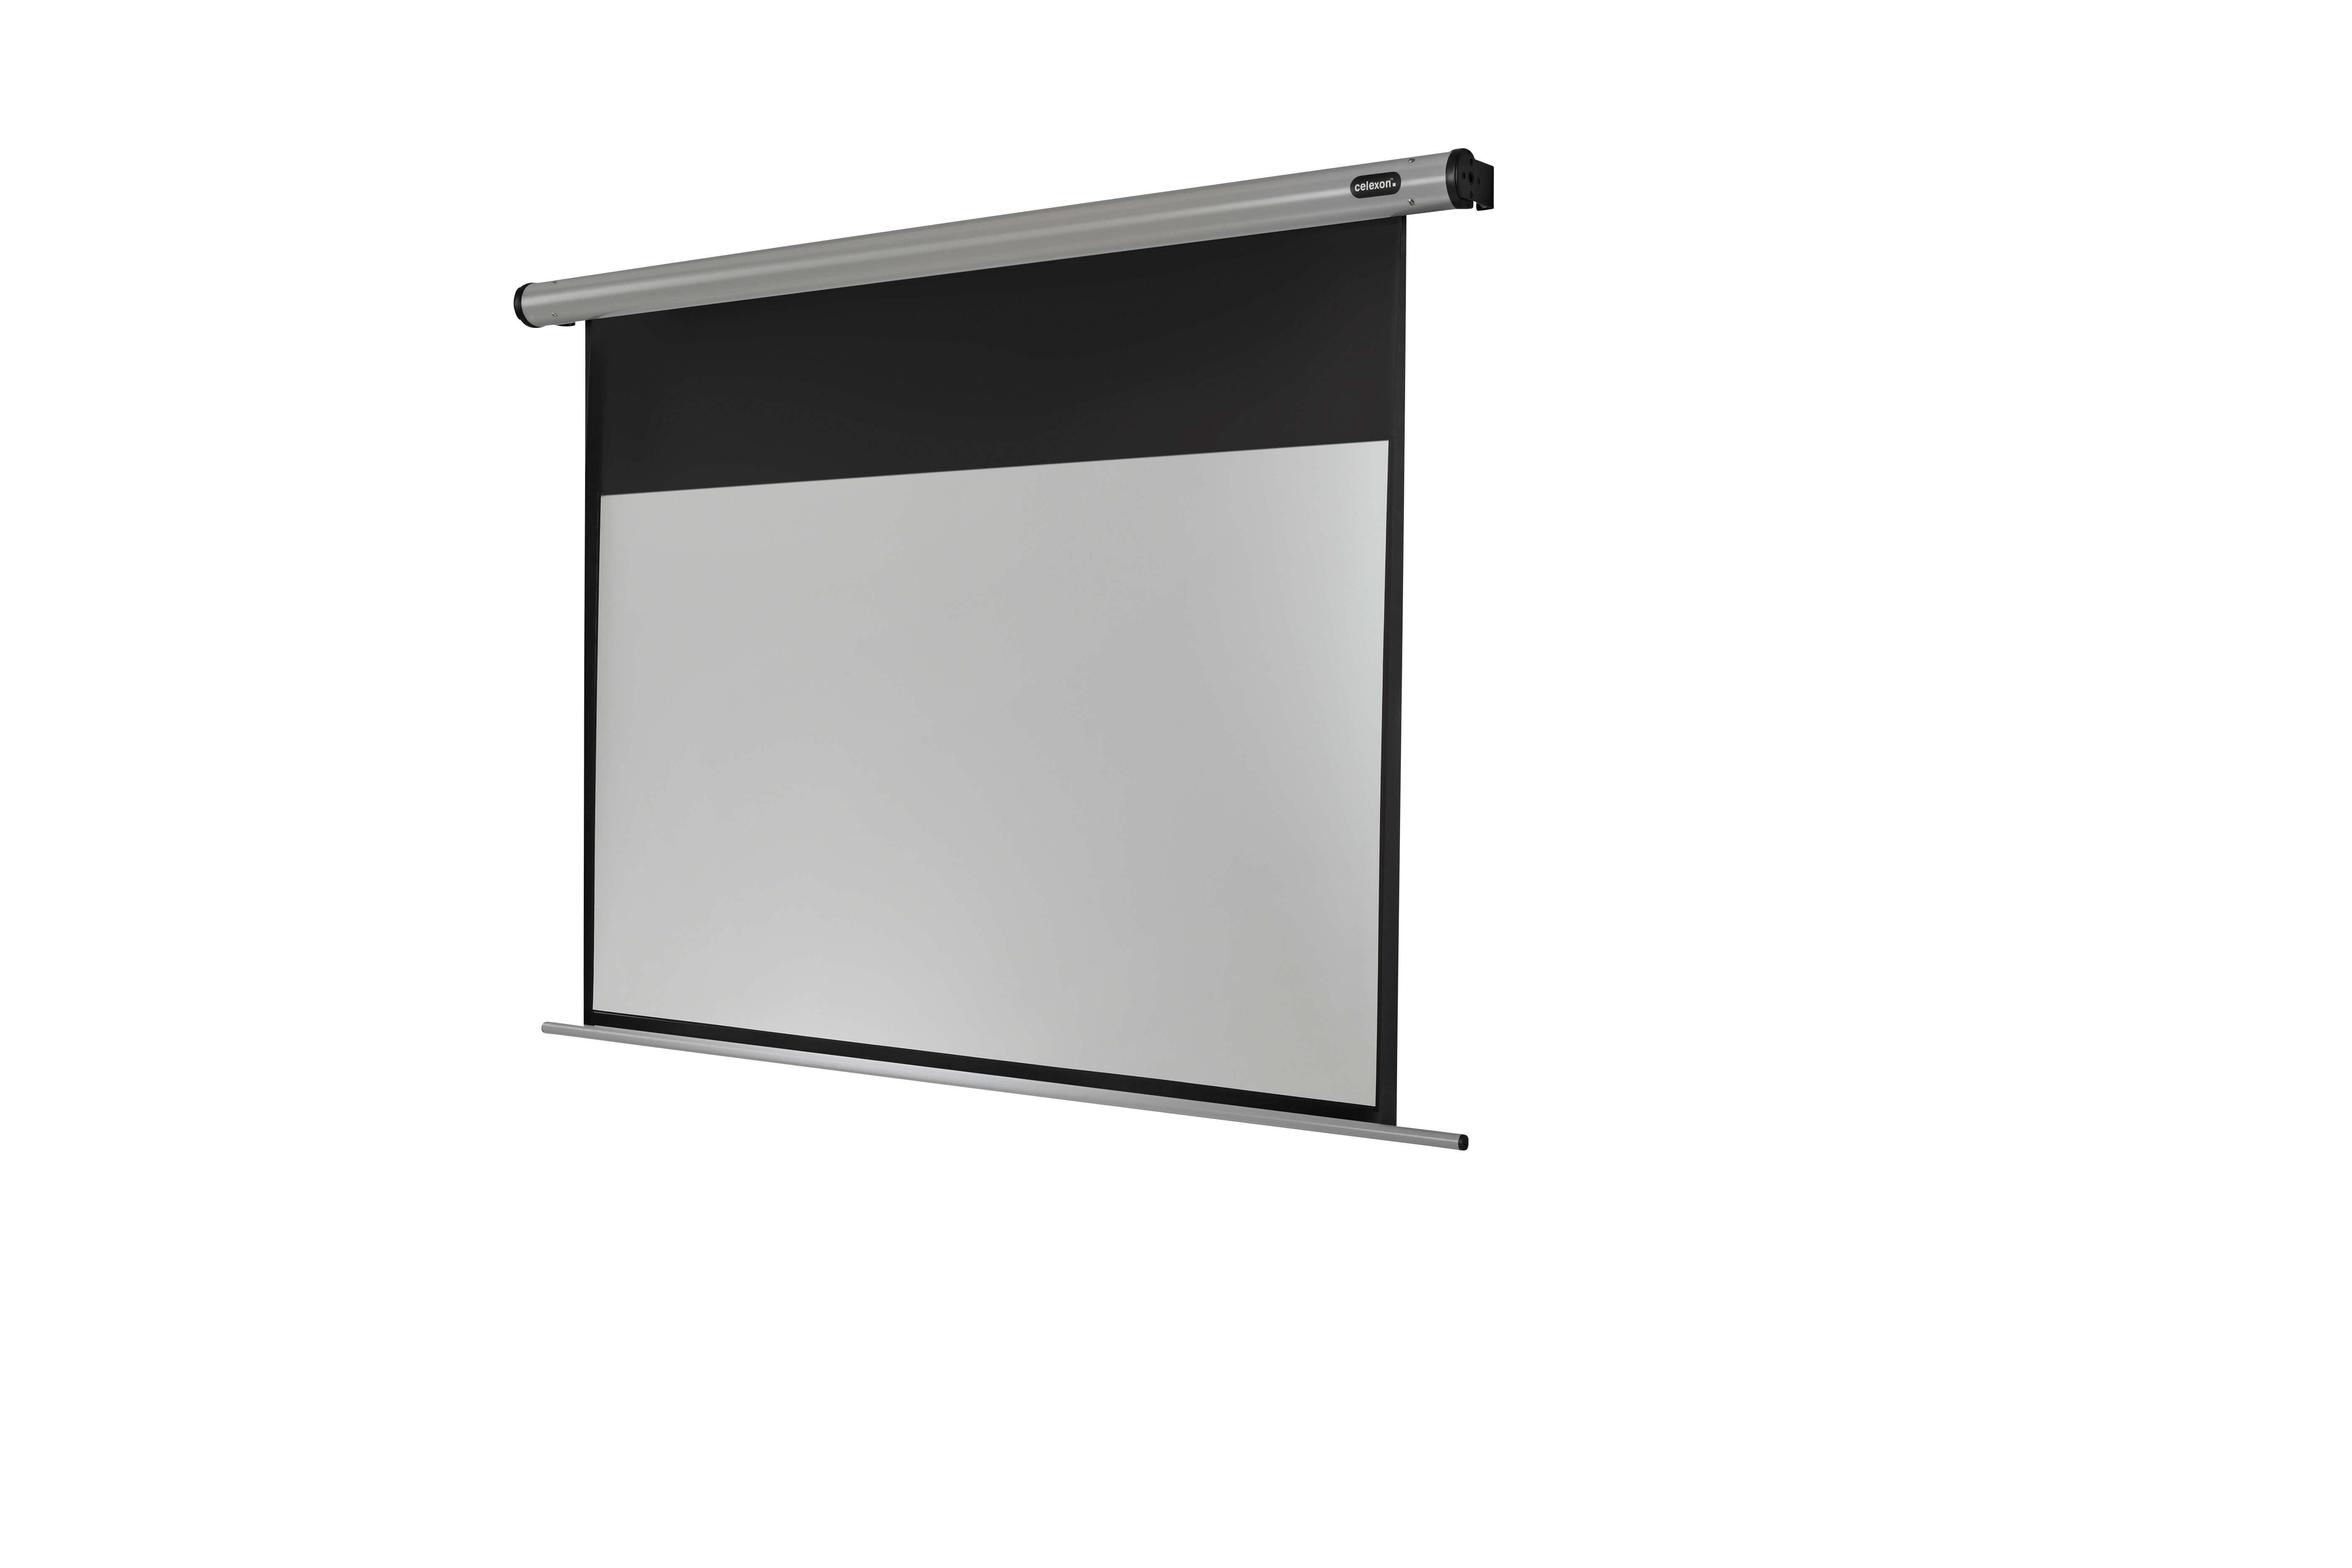 beamer leinwand beamer discount der blog f r beamer und zubeh rbeamer blog. Black Bedroom Furniture Sets. Home Design Ideas